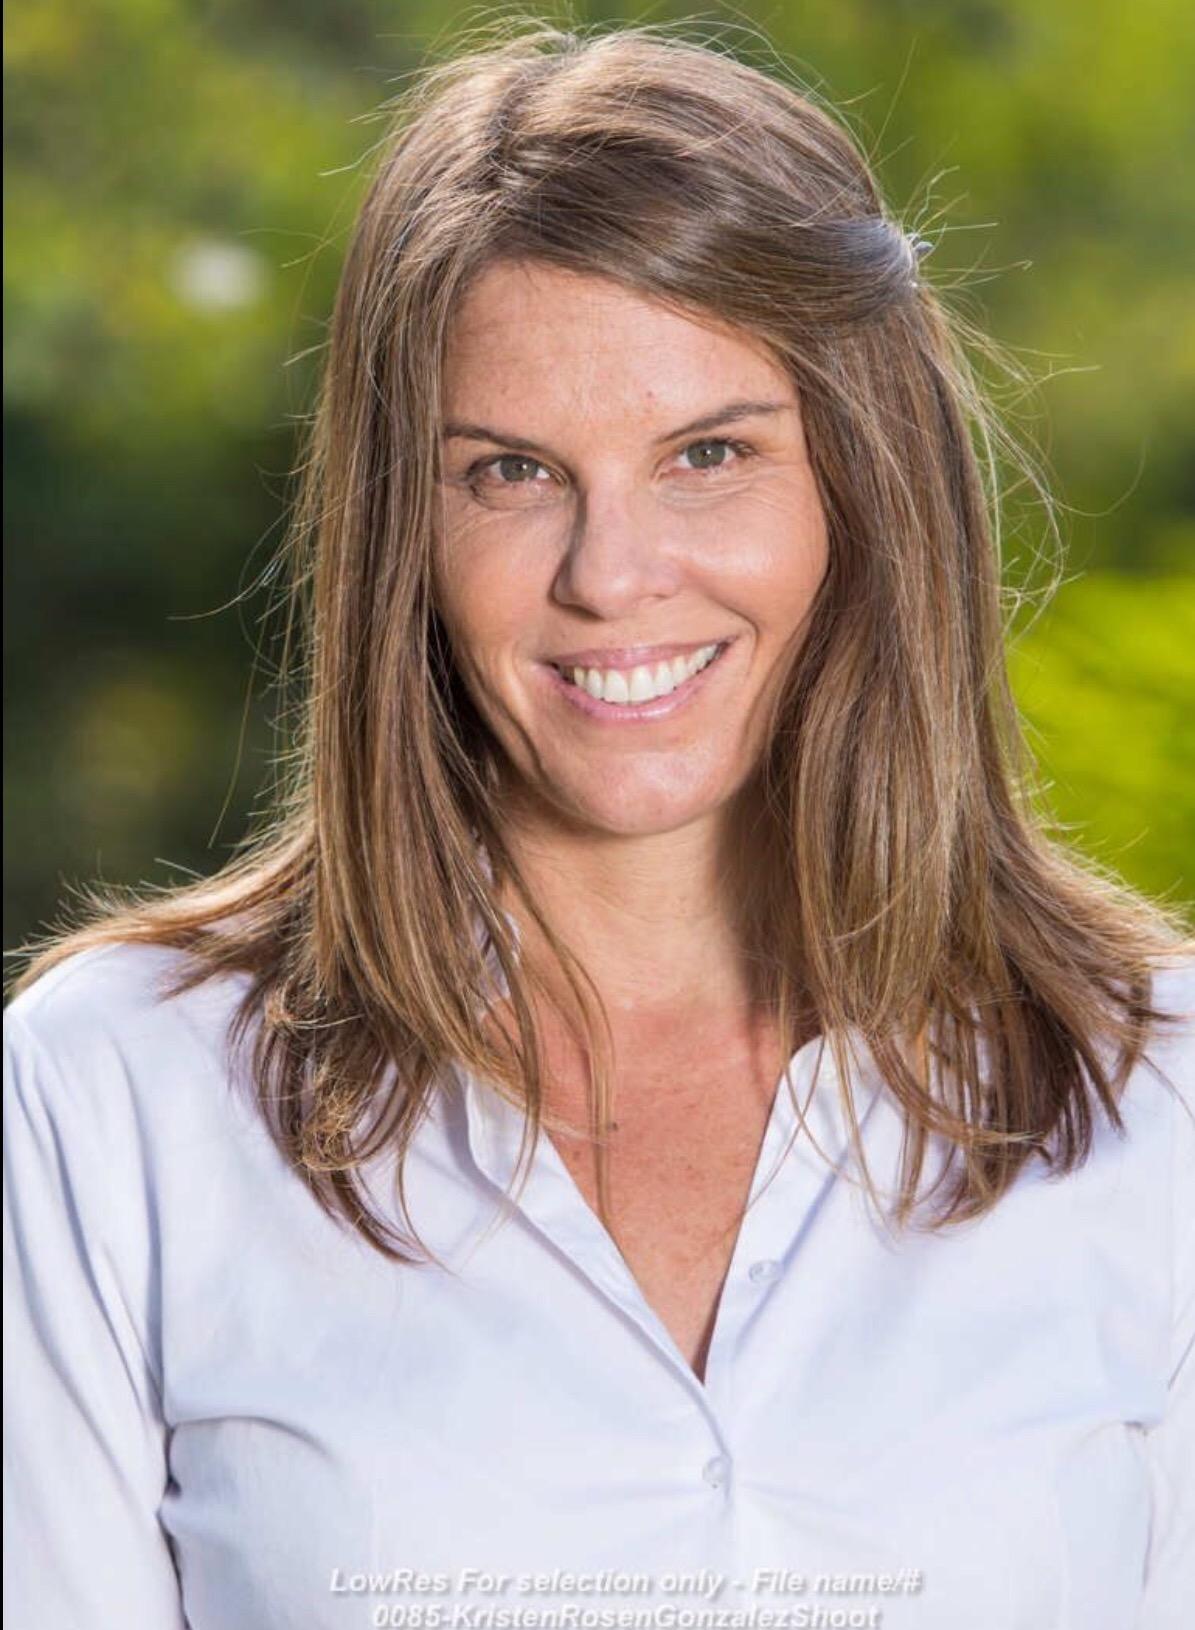 Kristen Rosen Gonzalez